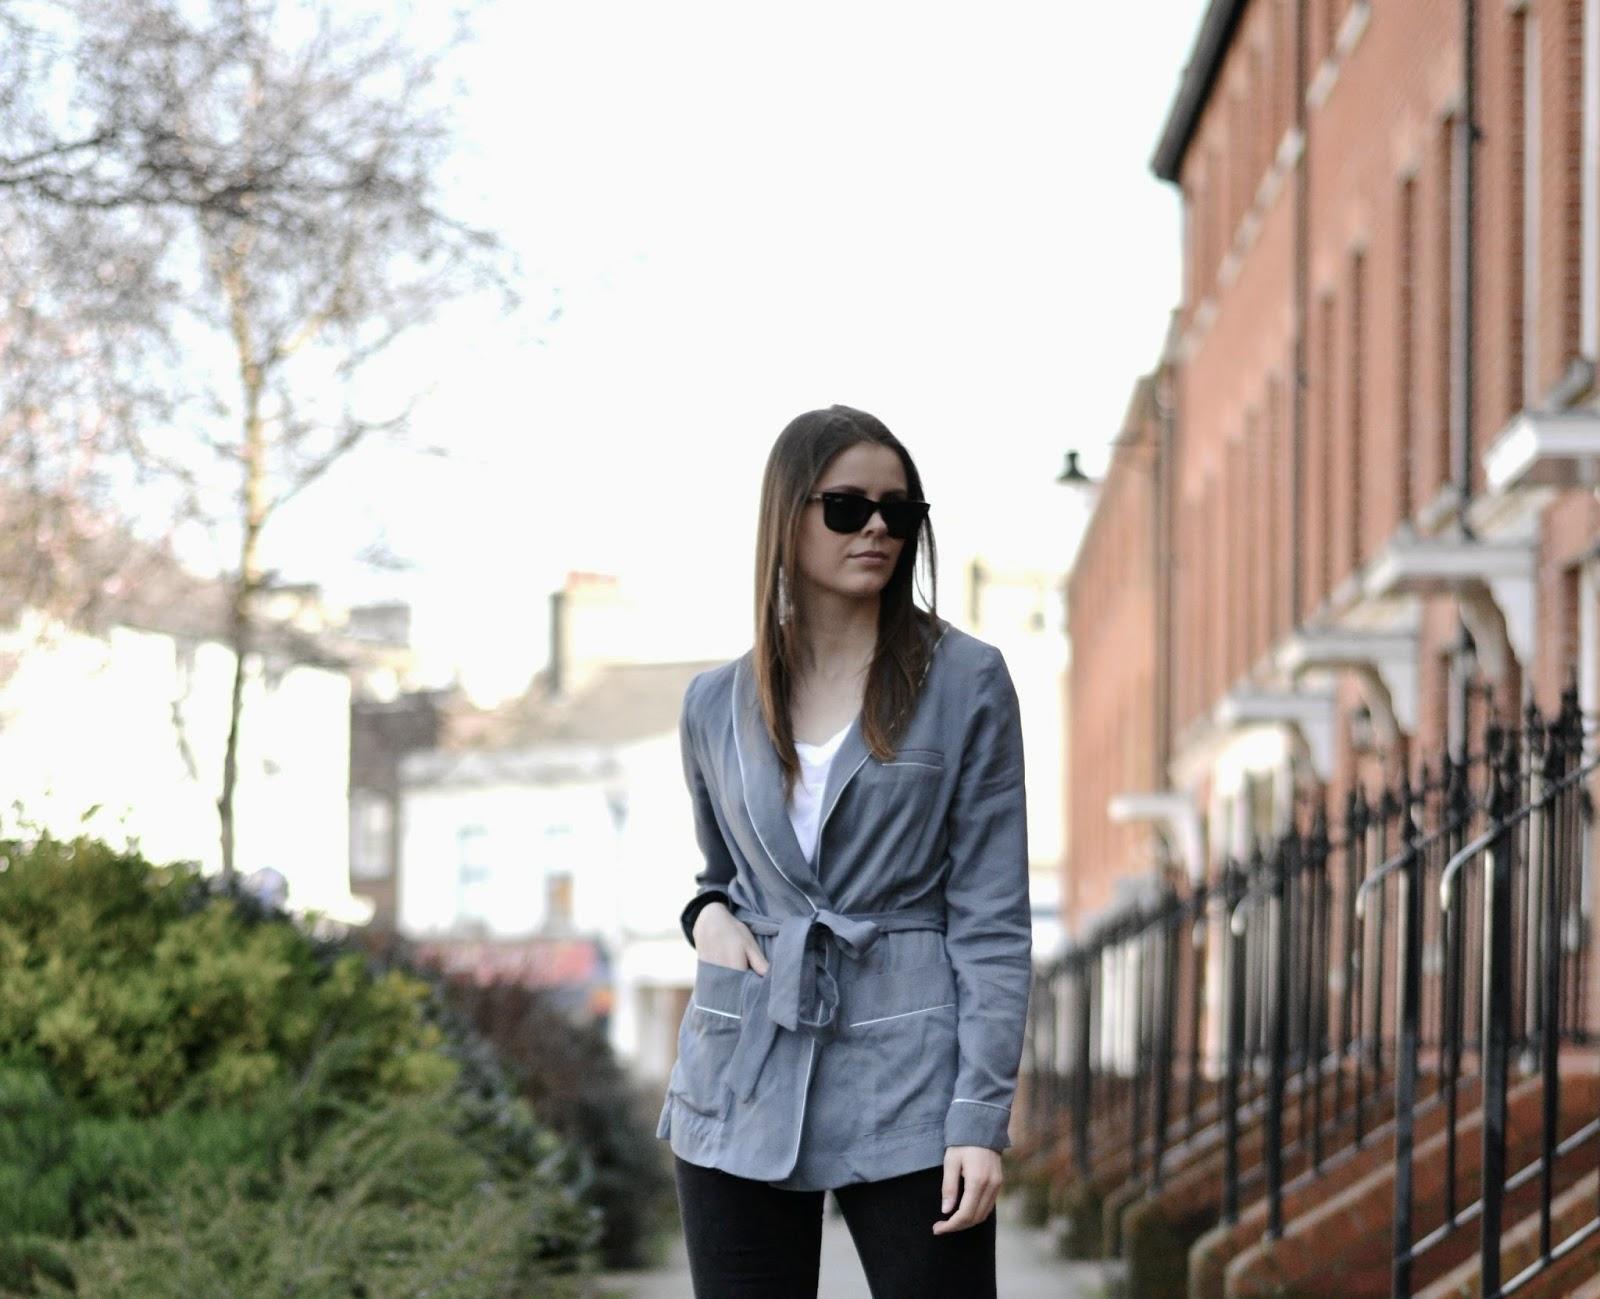 Kimono-Flared-Jeans-Itslilylocket-LucyMason